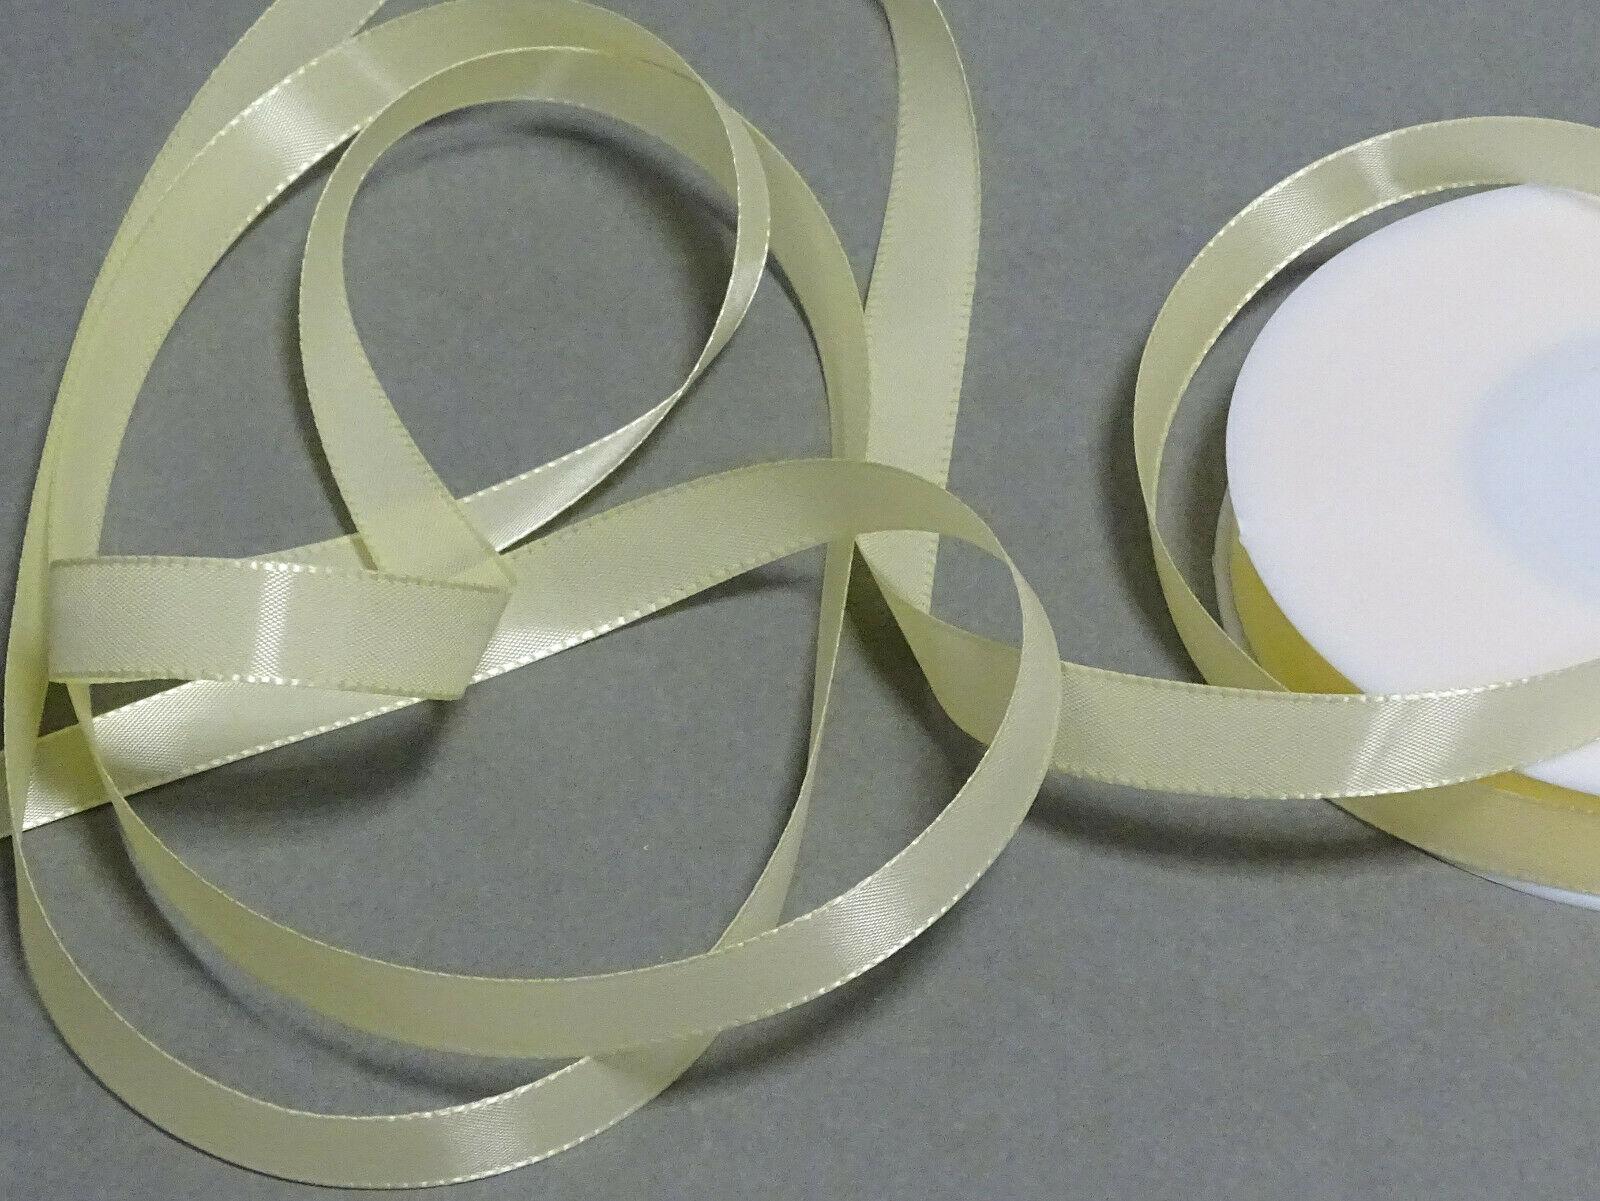 Seidenband Schleifenband 50 m x 15 / 25 / 40mm Dekoband ab 0,08€/m Geschenkband  - Creme 105, 25 mm x 50 m